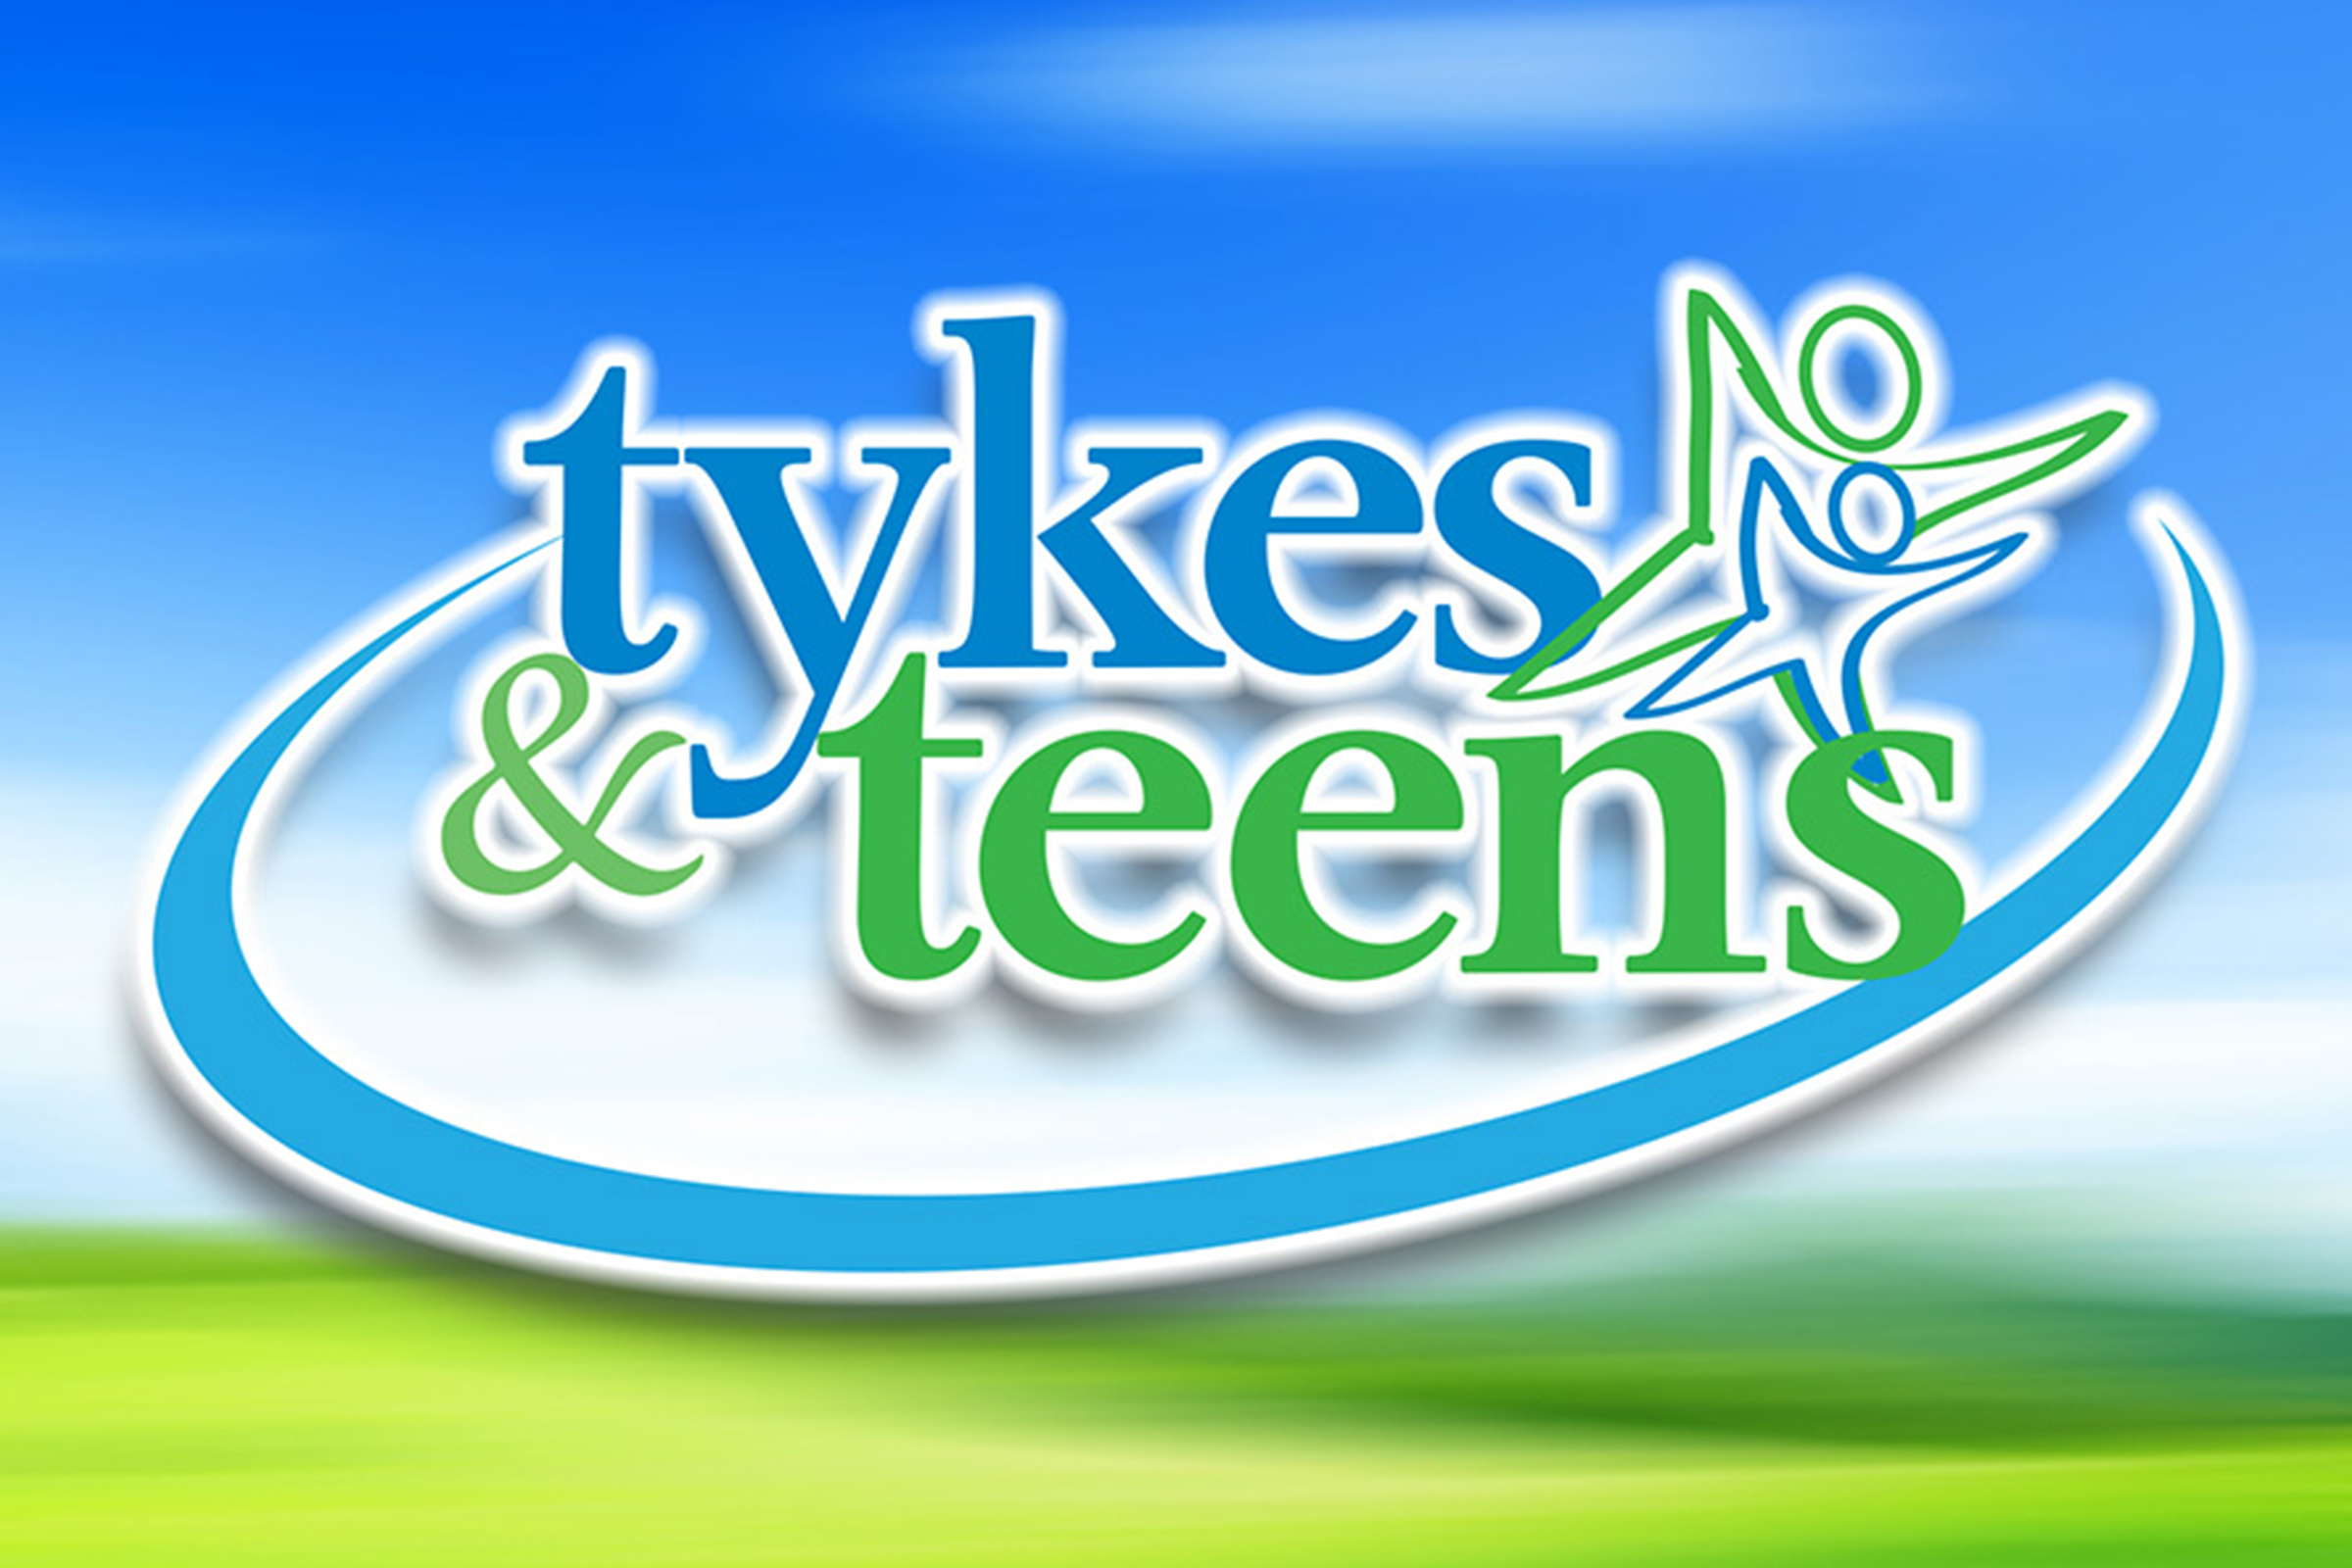 Tykes & Teens